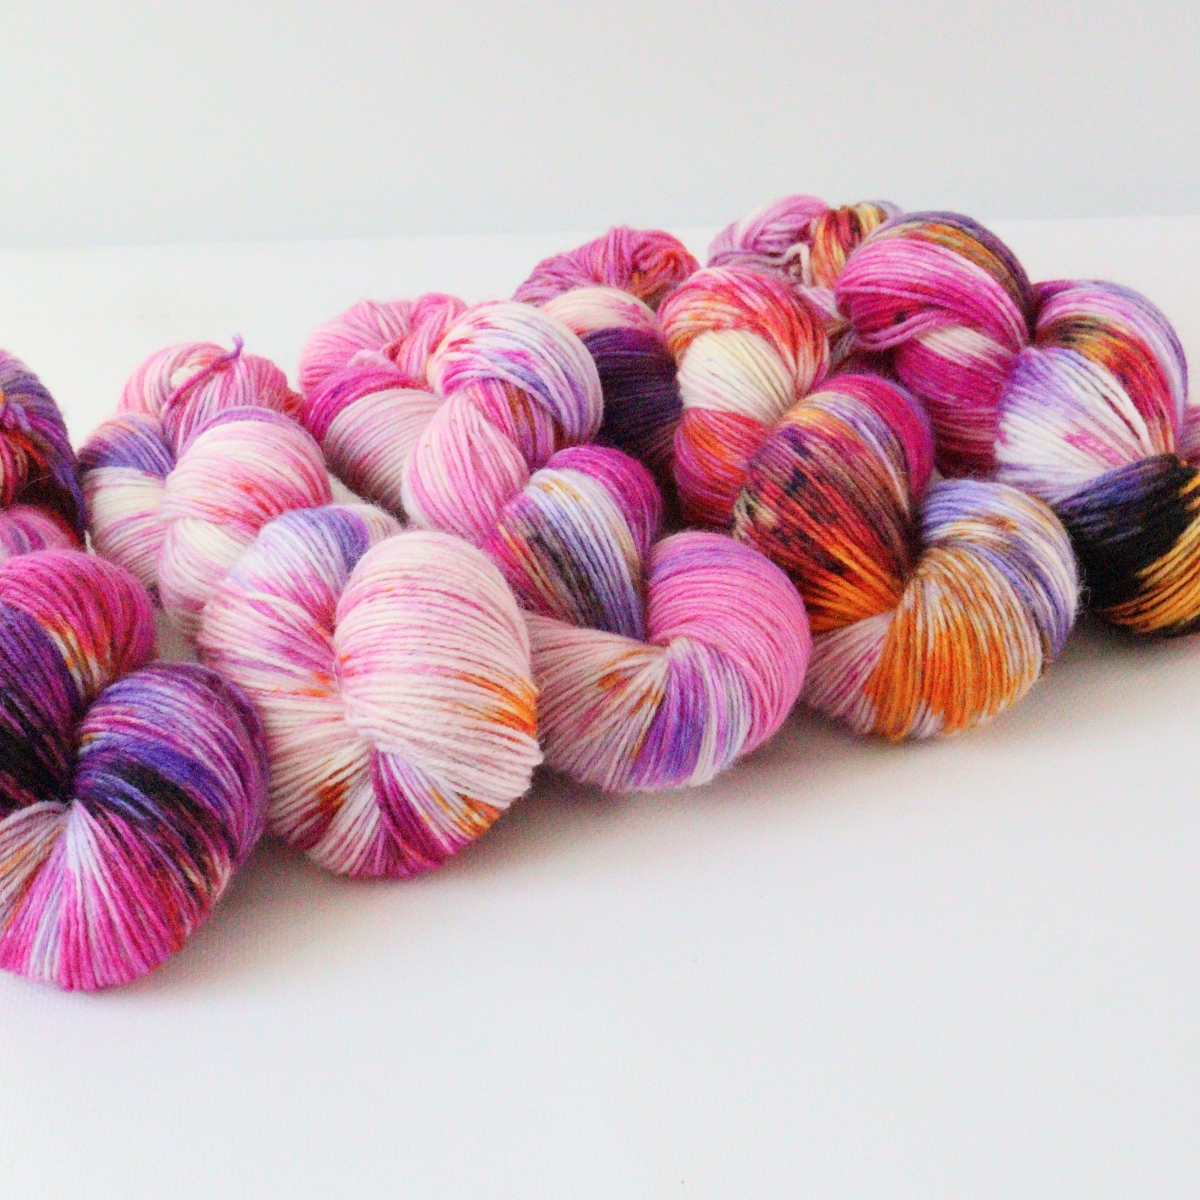 woodico.pro hand dyed yarn 084 2 1200x1200 - Hand dyed yarn / 084